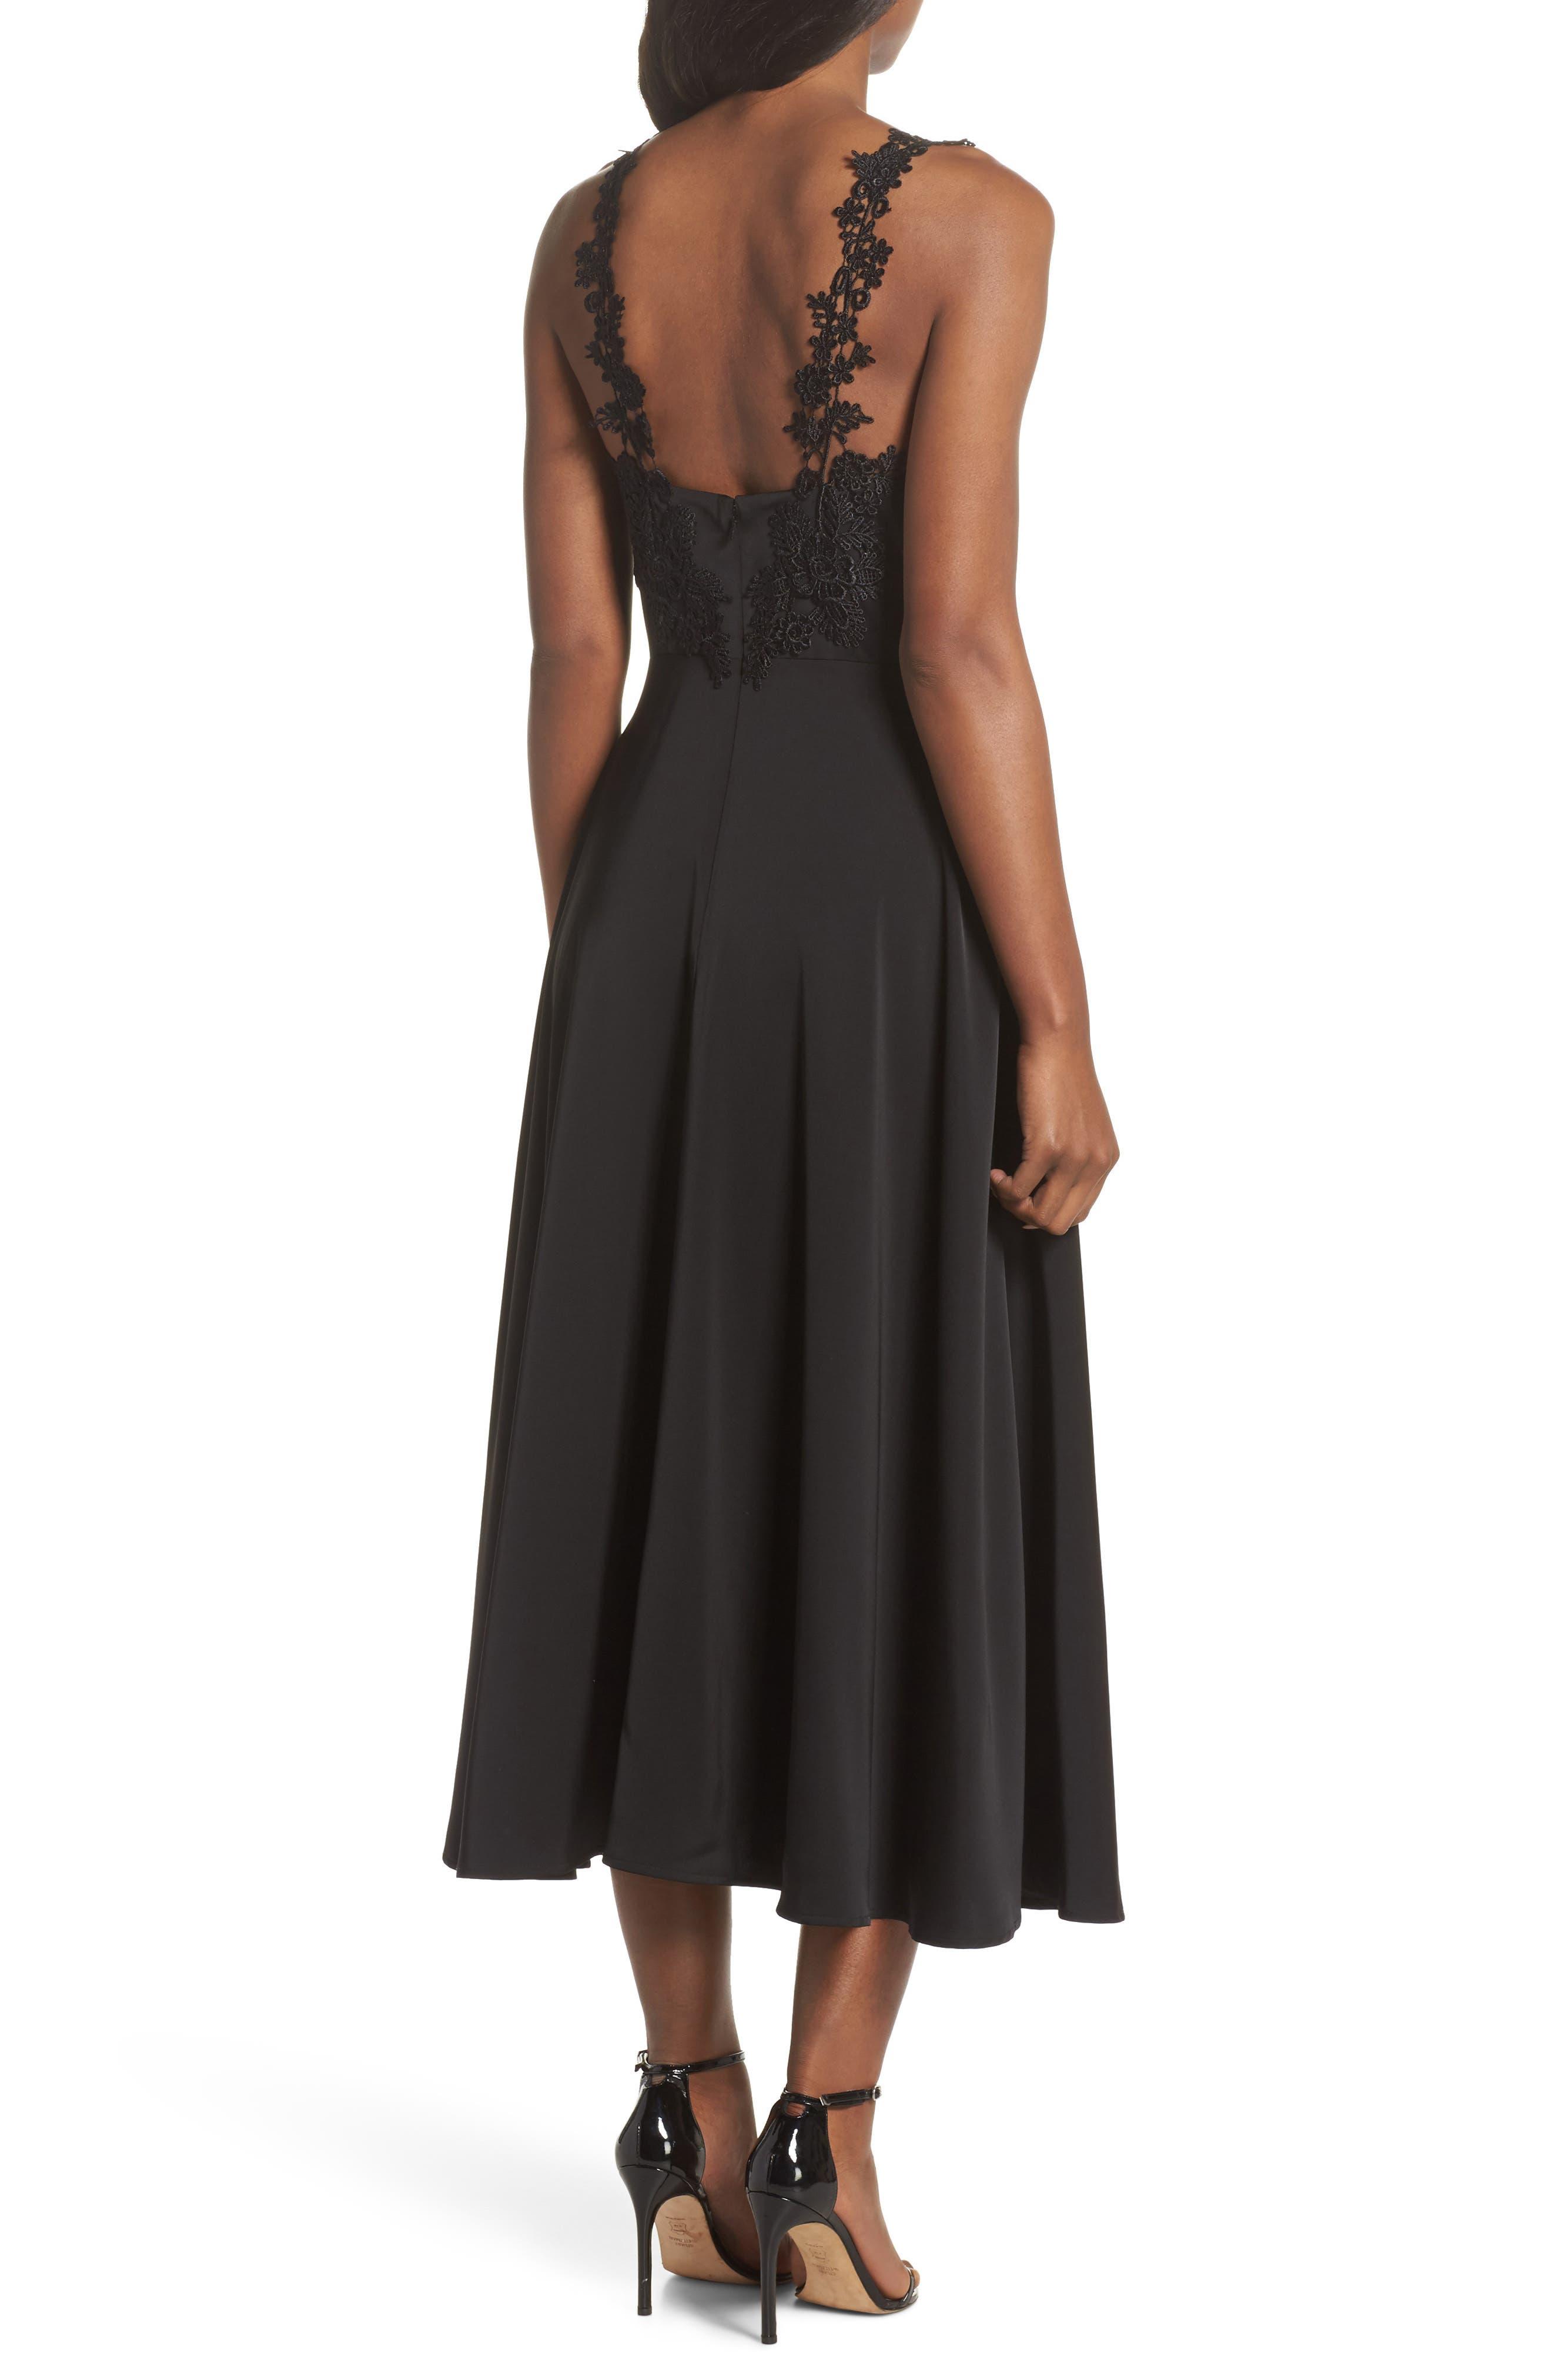 Aislinn Floral Appliqué Tea Length Dress,                             Alternate thumbnail 2, color,                             Black Multi